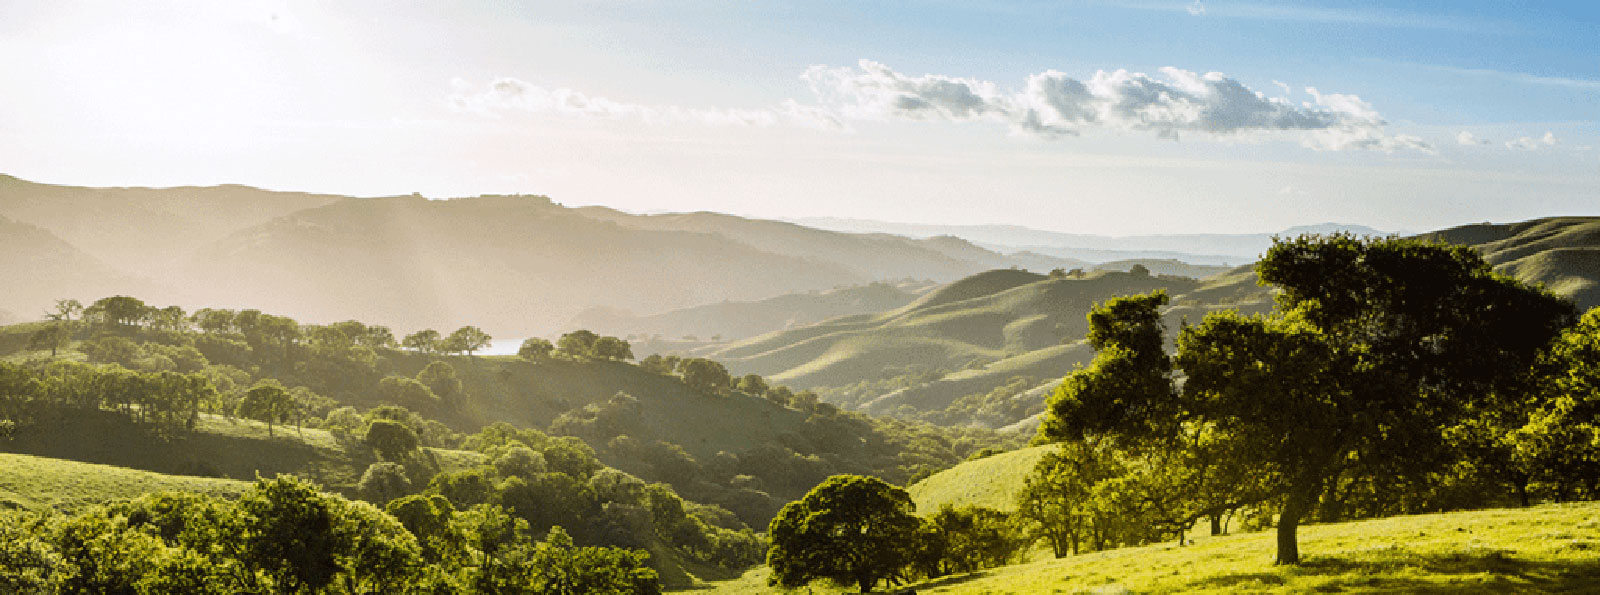 Tri-Valley Hills, California